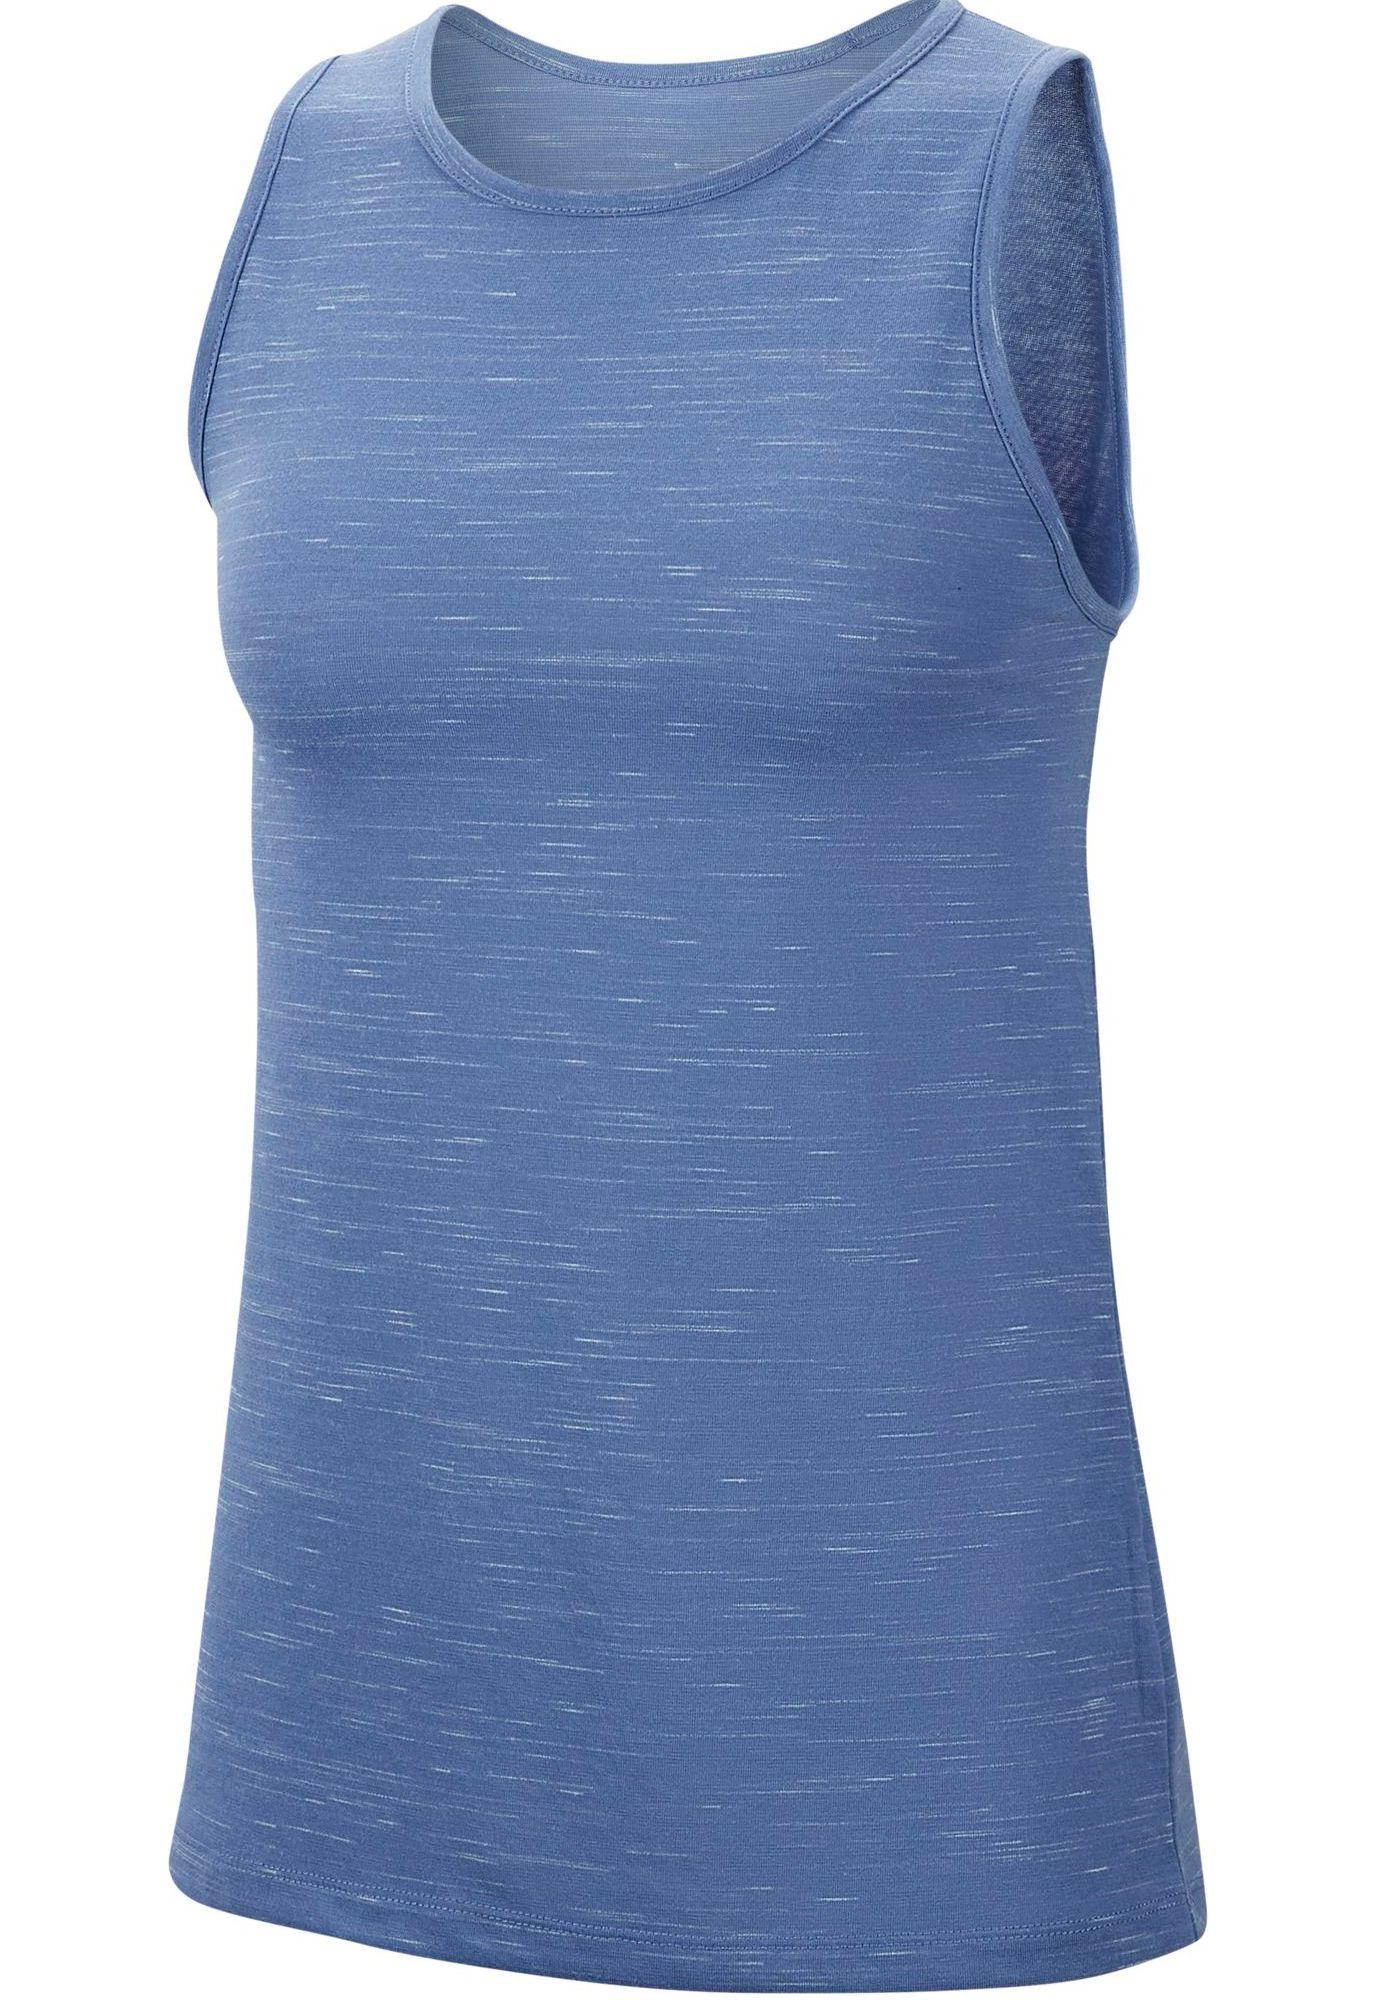 Nike Women's Dri-FIT Tomboy Veneer Tank Top